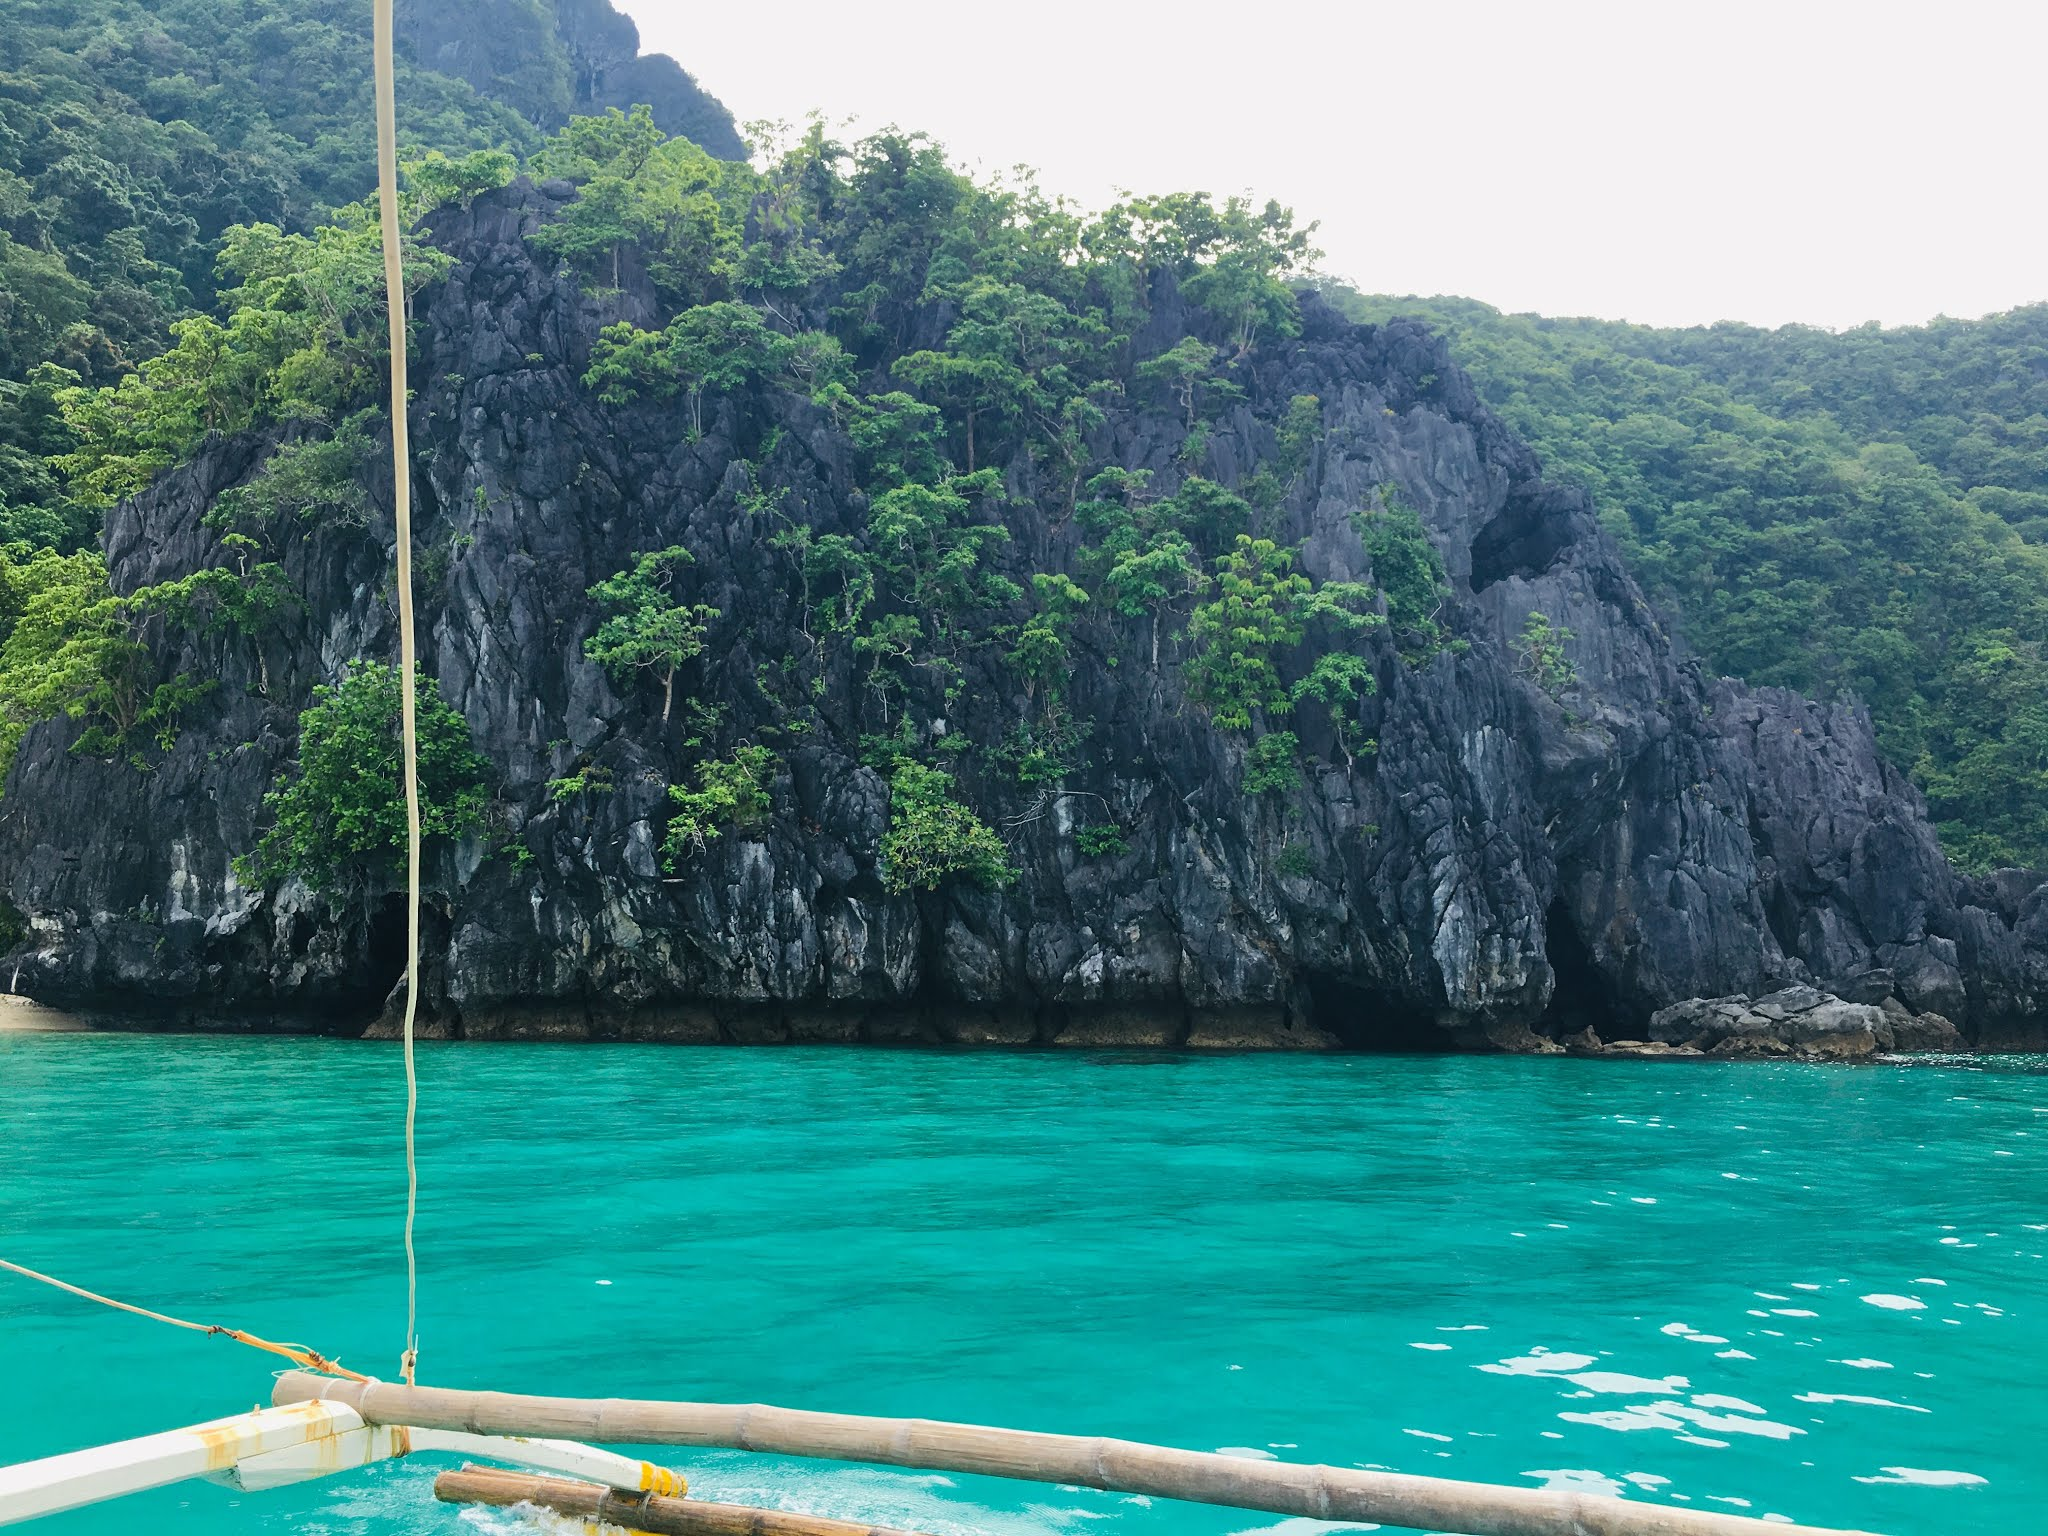 El Nido Palawan, Activities to do in El Nido, Glifestyleph